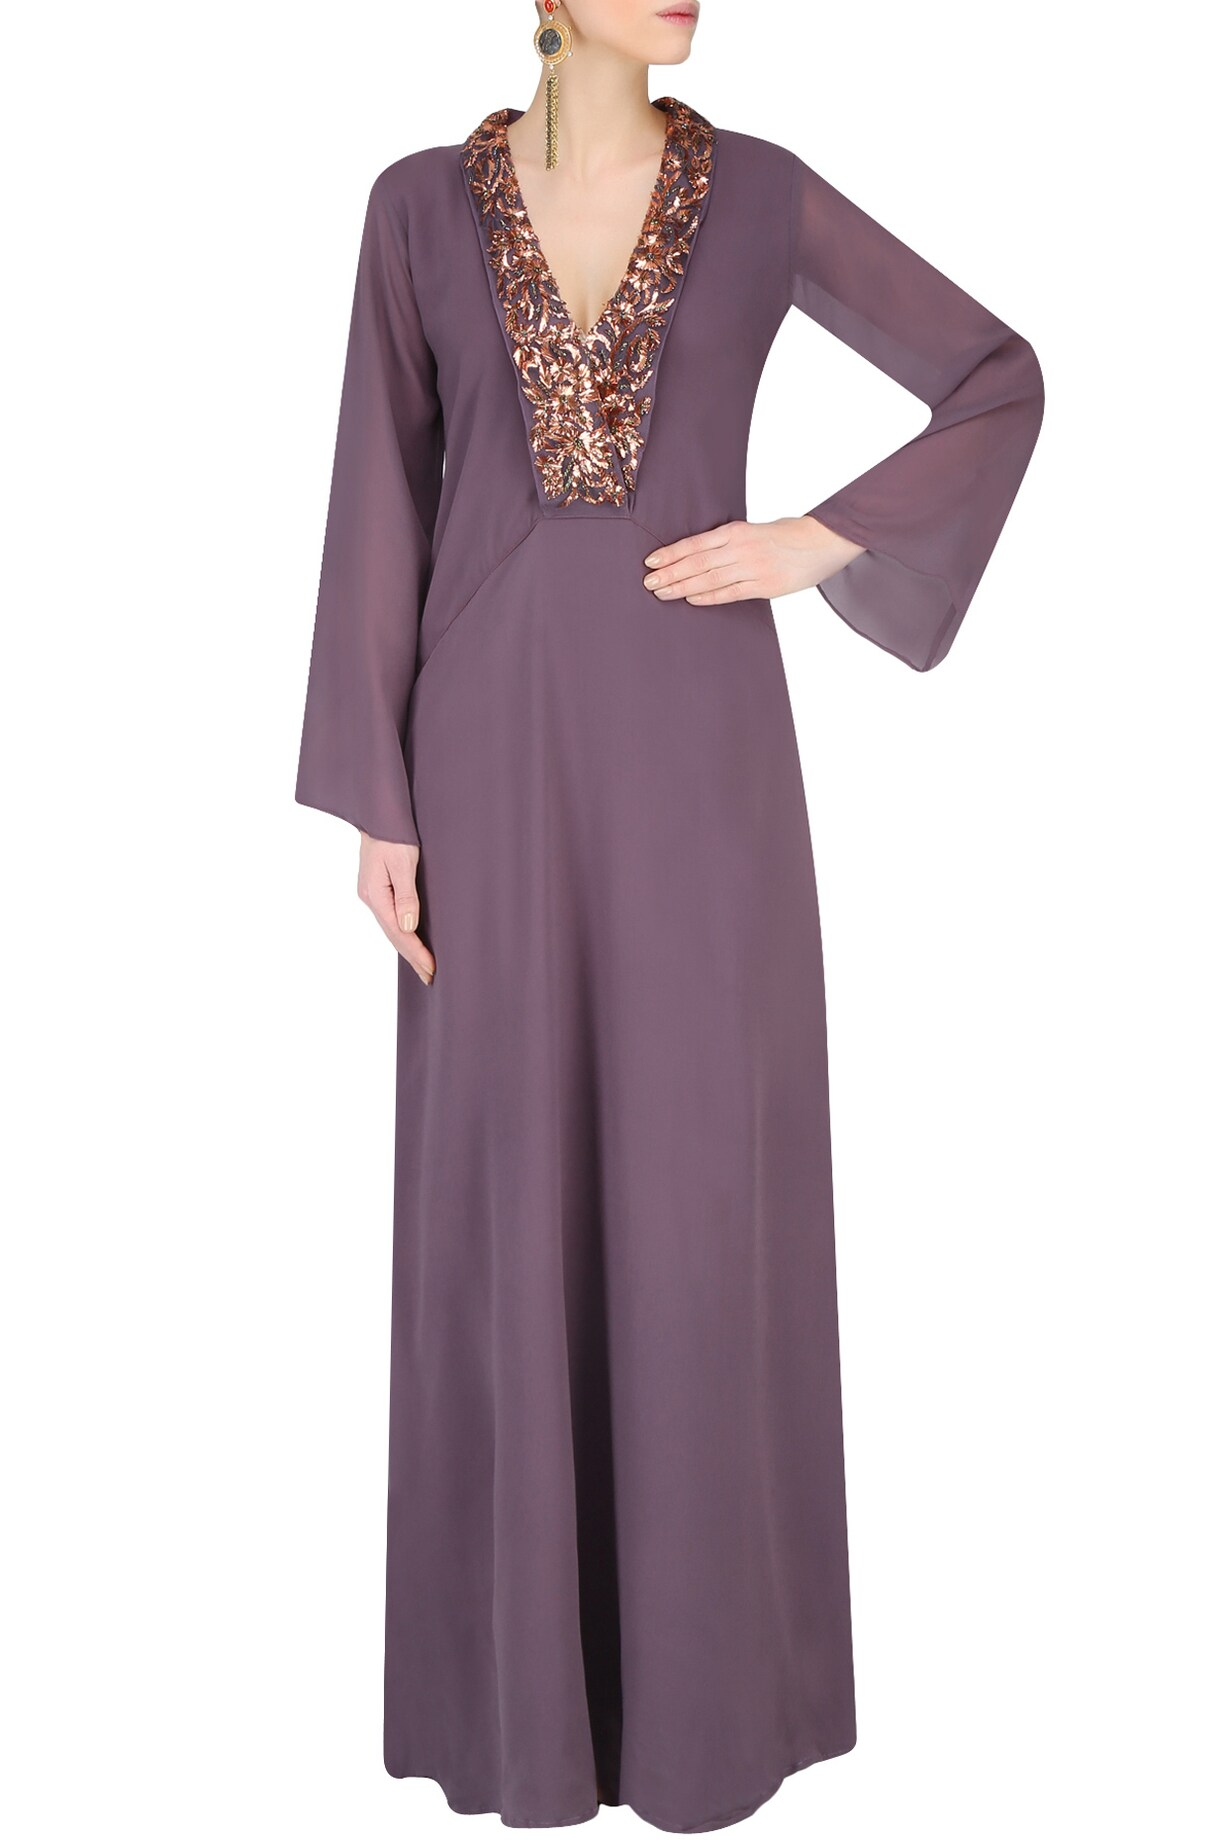 Nimirta Lalwani Gowns